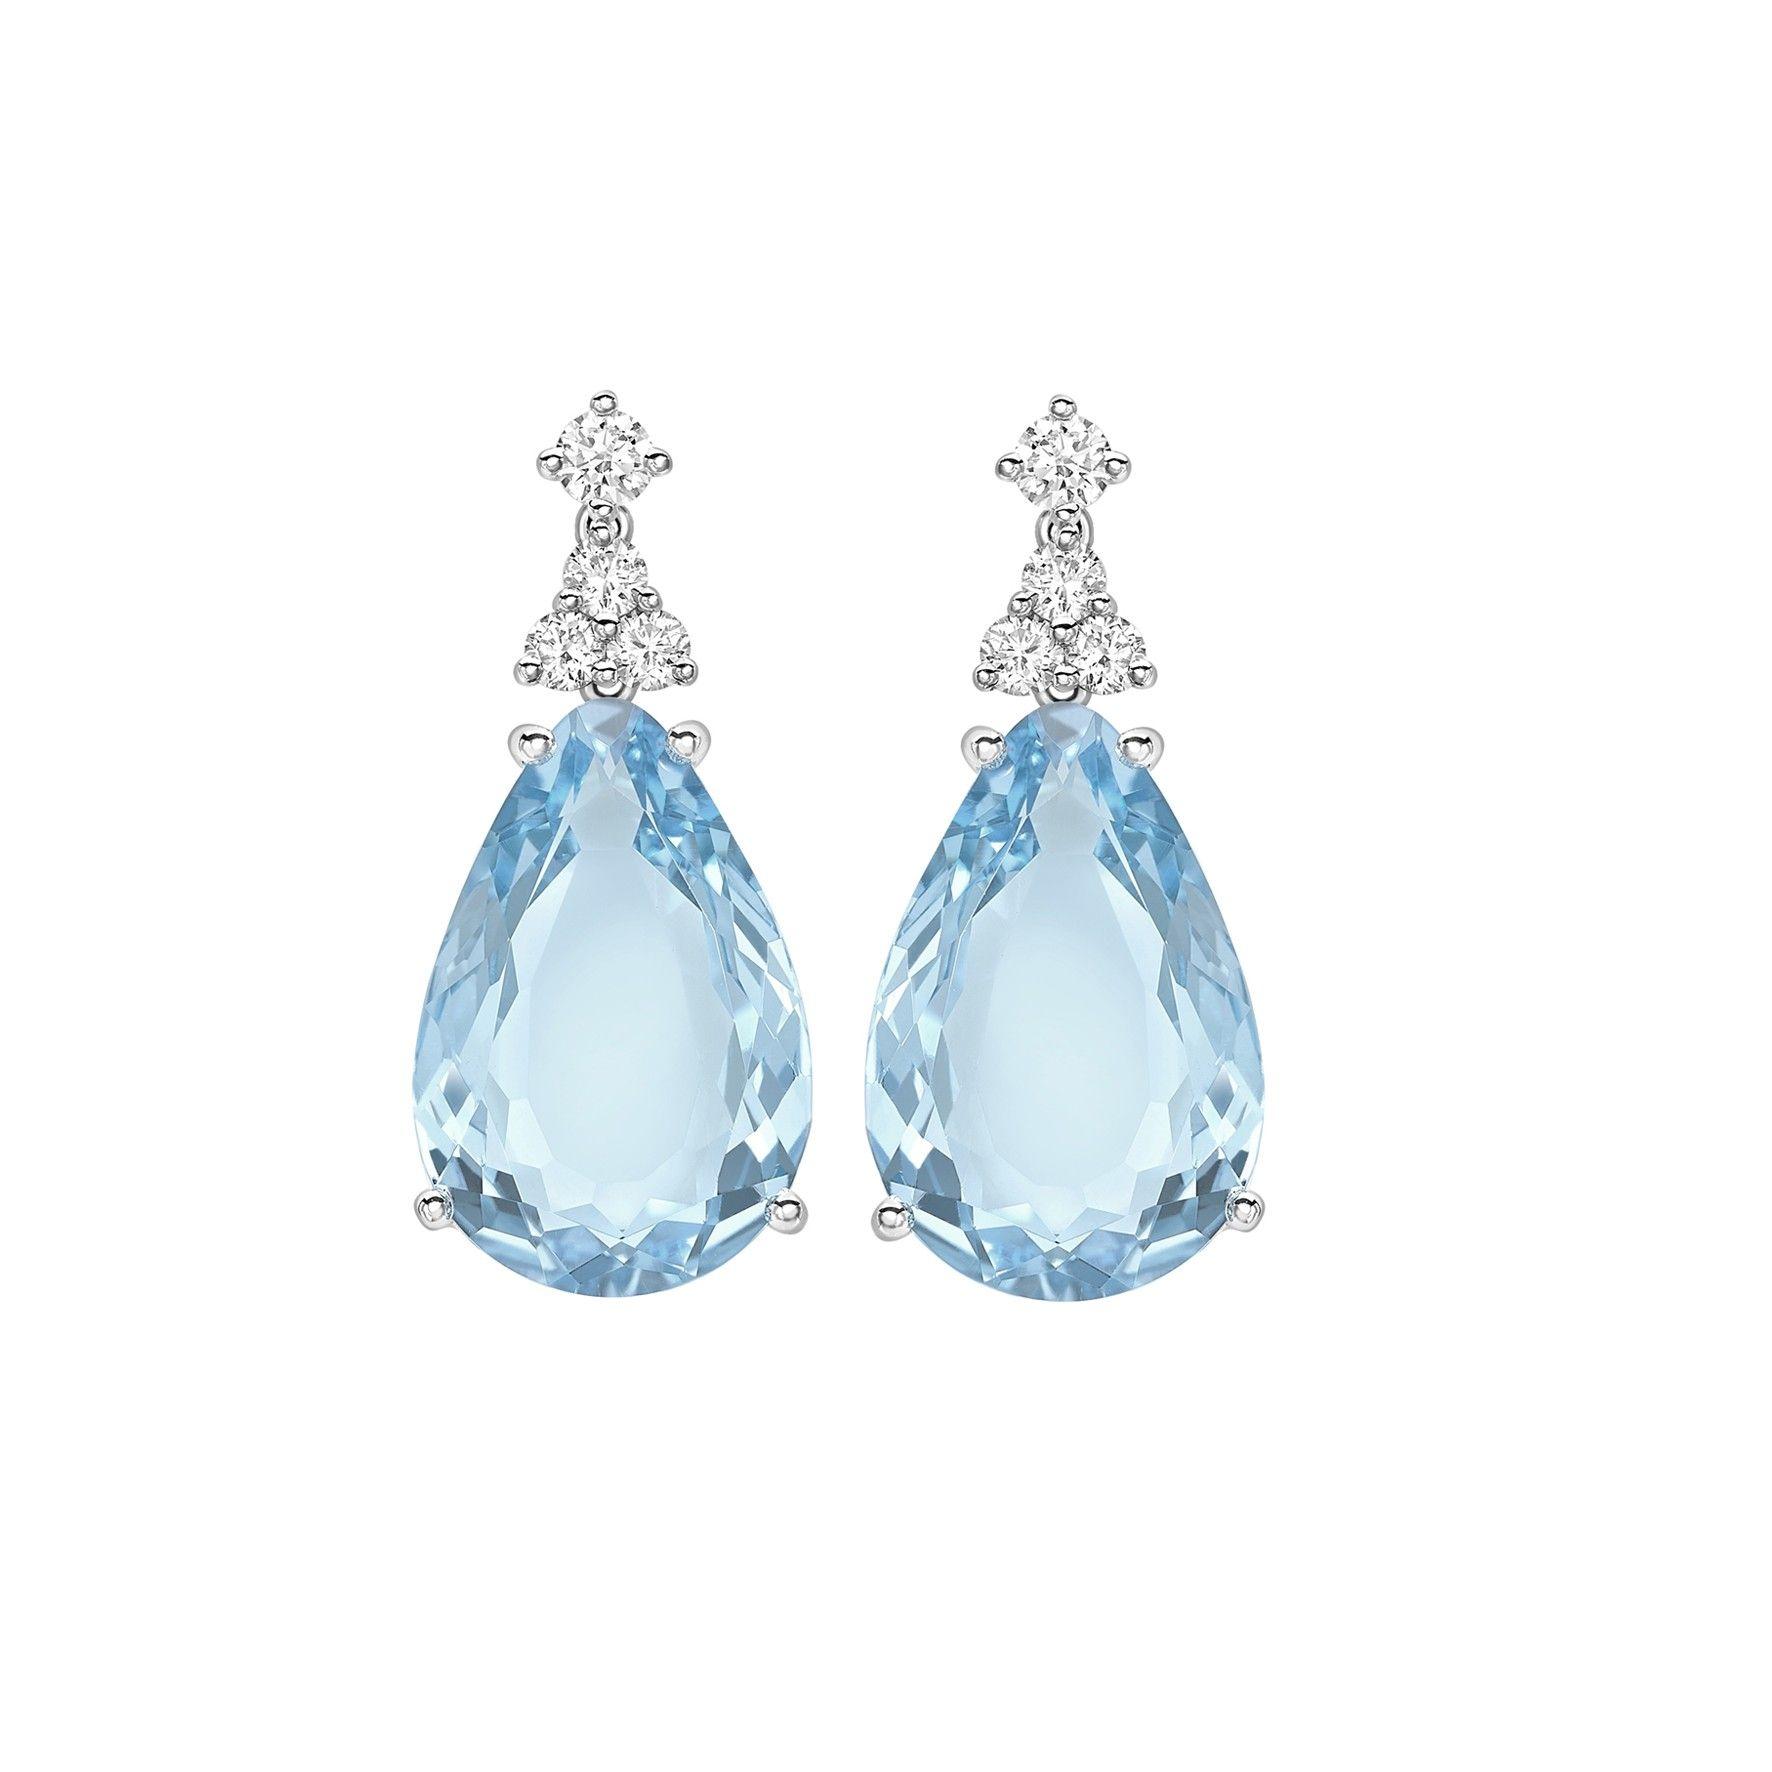 Kiki McDonough Candy Mini Blue Topaz and Diamond Earrings